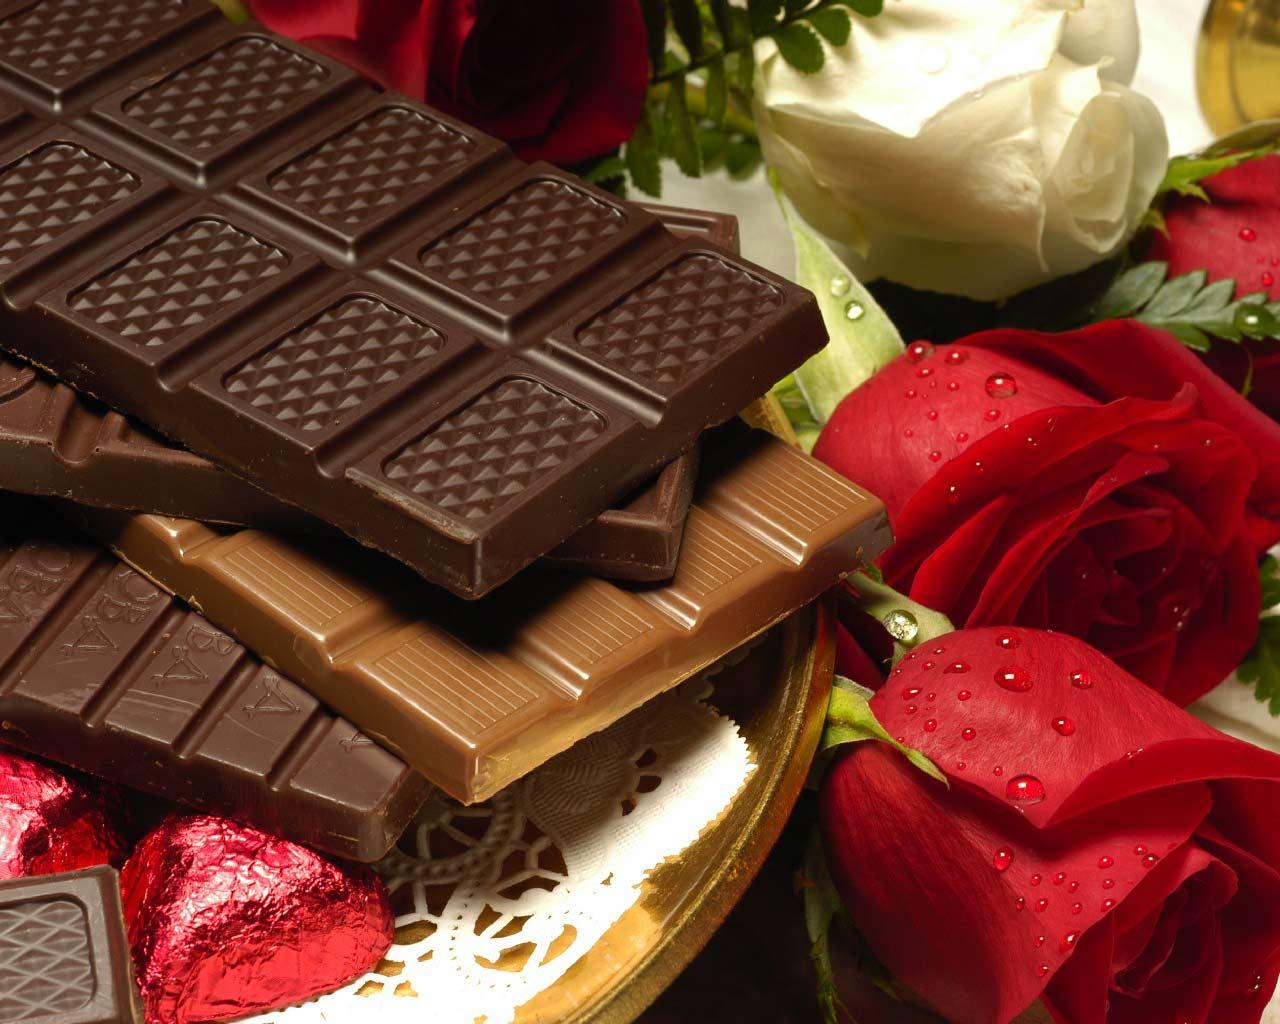 ovticartmy chocolate wallpaper chocolate scraps chocolate day 1280x1024